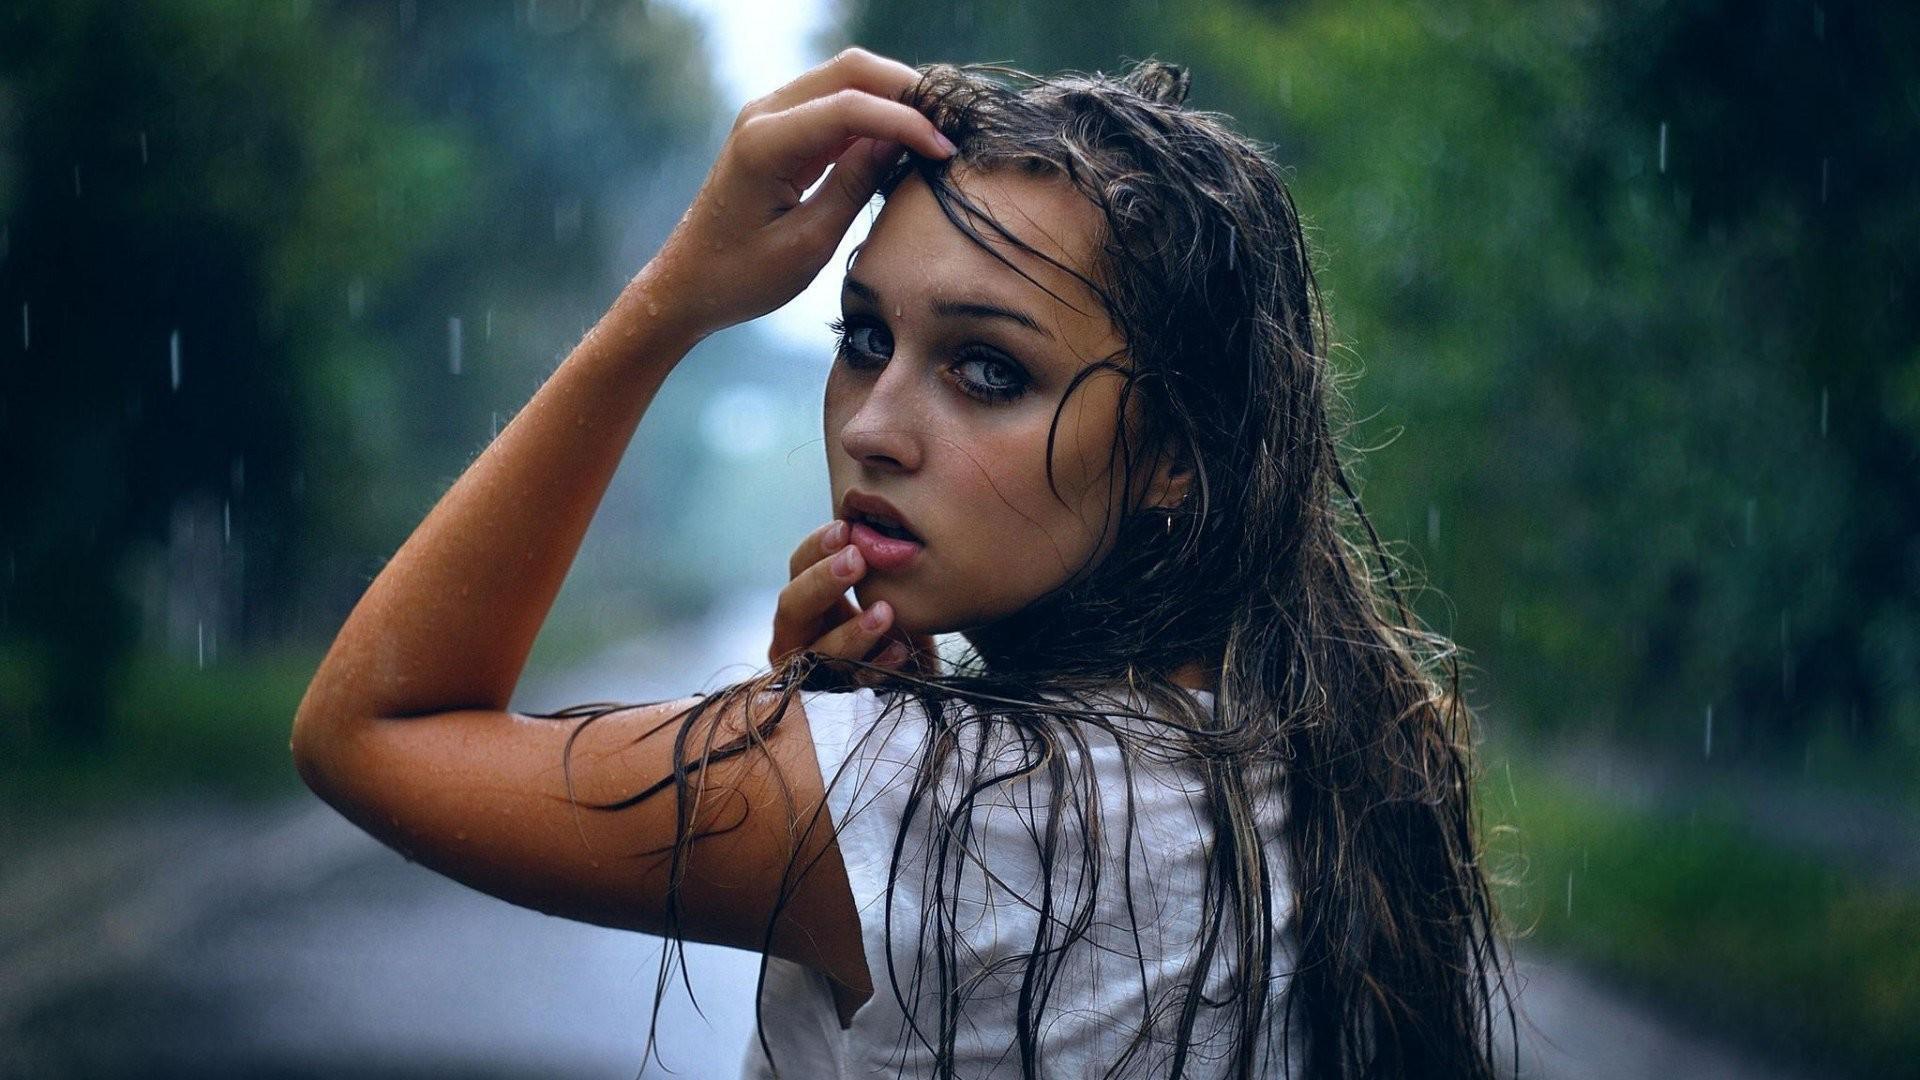 WDB Girl In Rain Wallpapers Special Girl In Rain HD